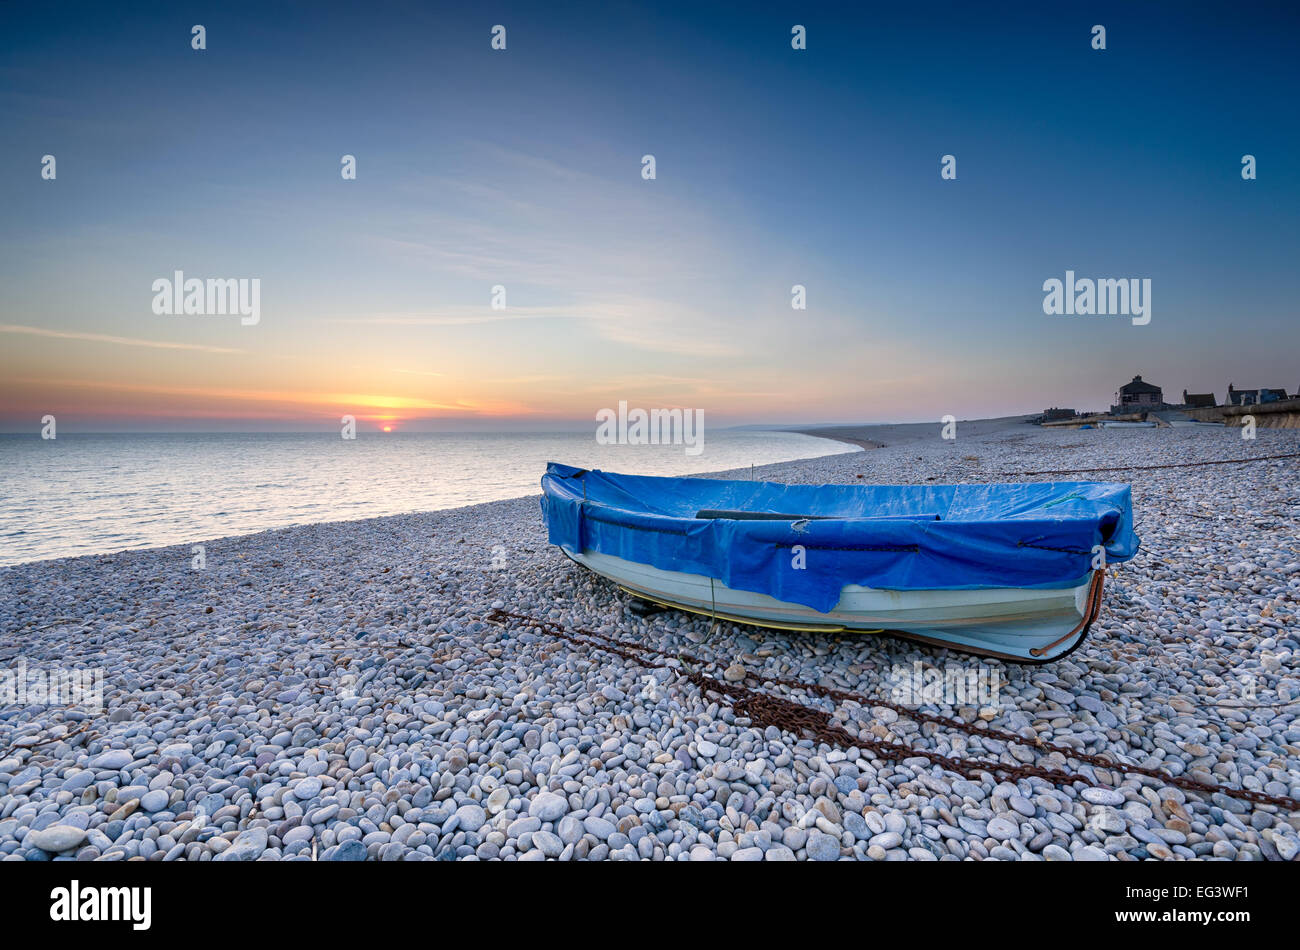 Angelboot/Fischerboot auf Chesil Beach in Portland, Dorset Stockbild